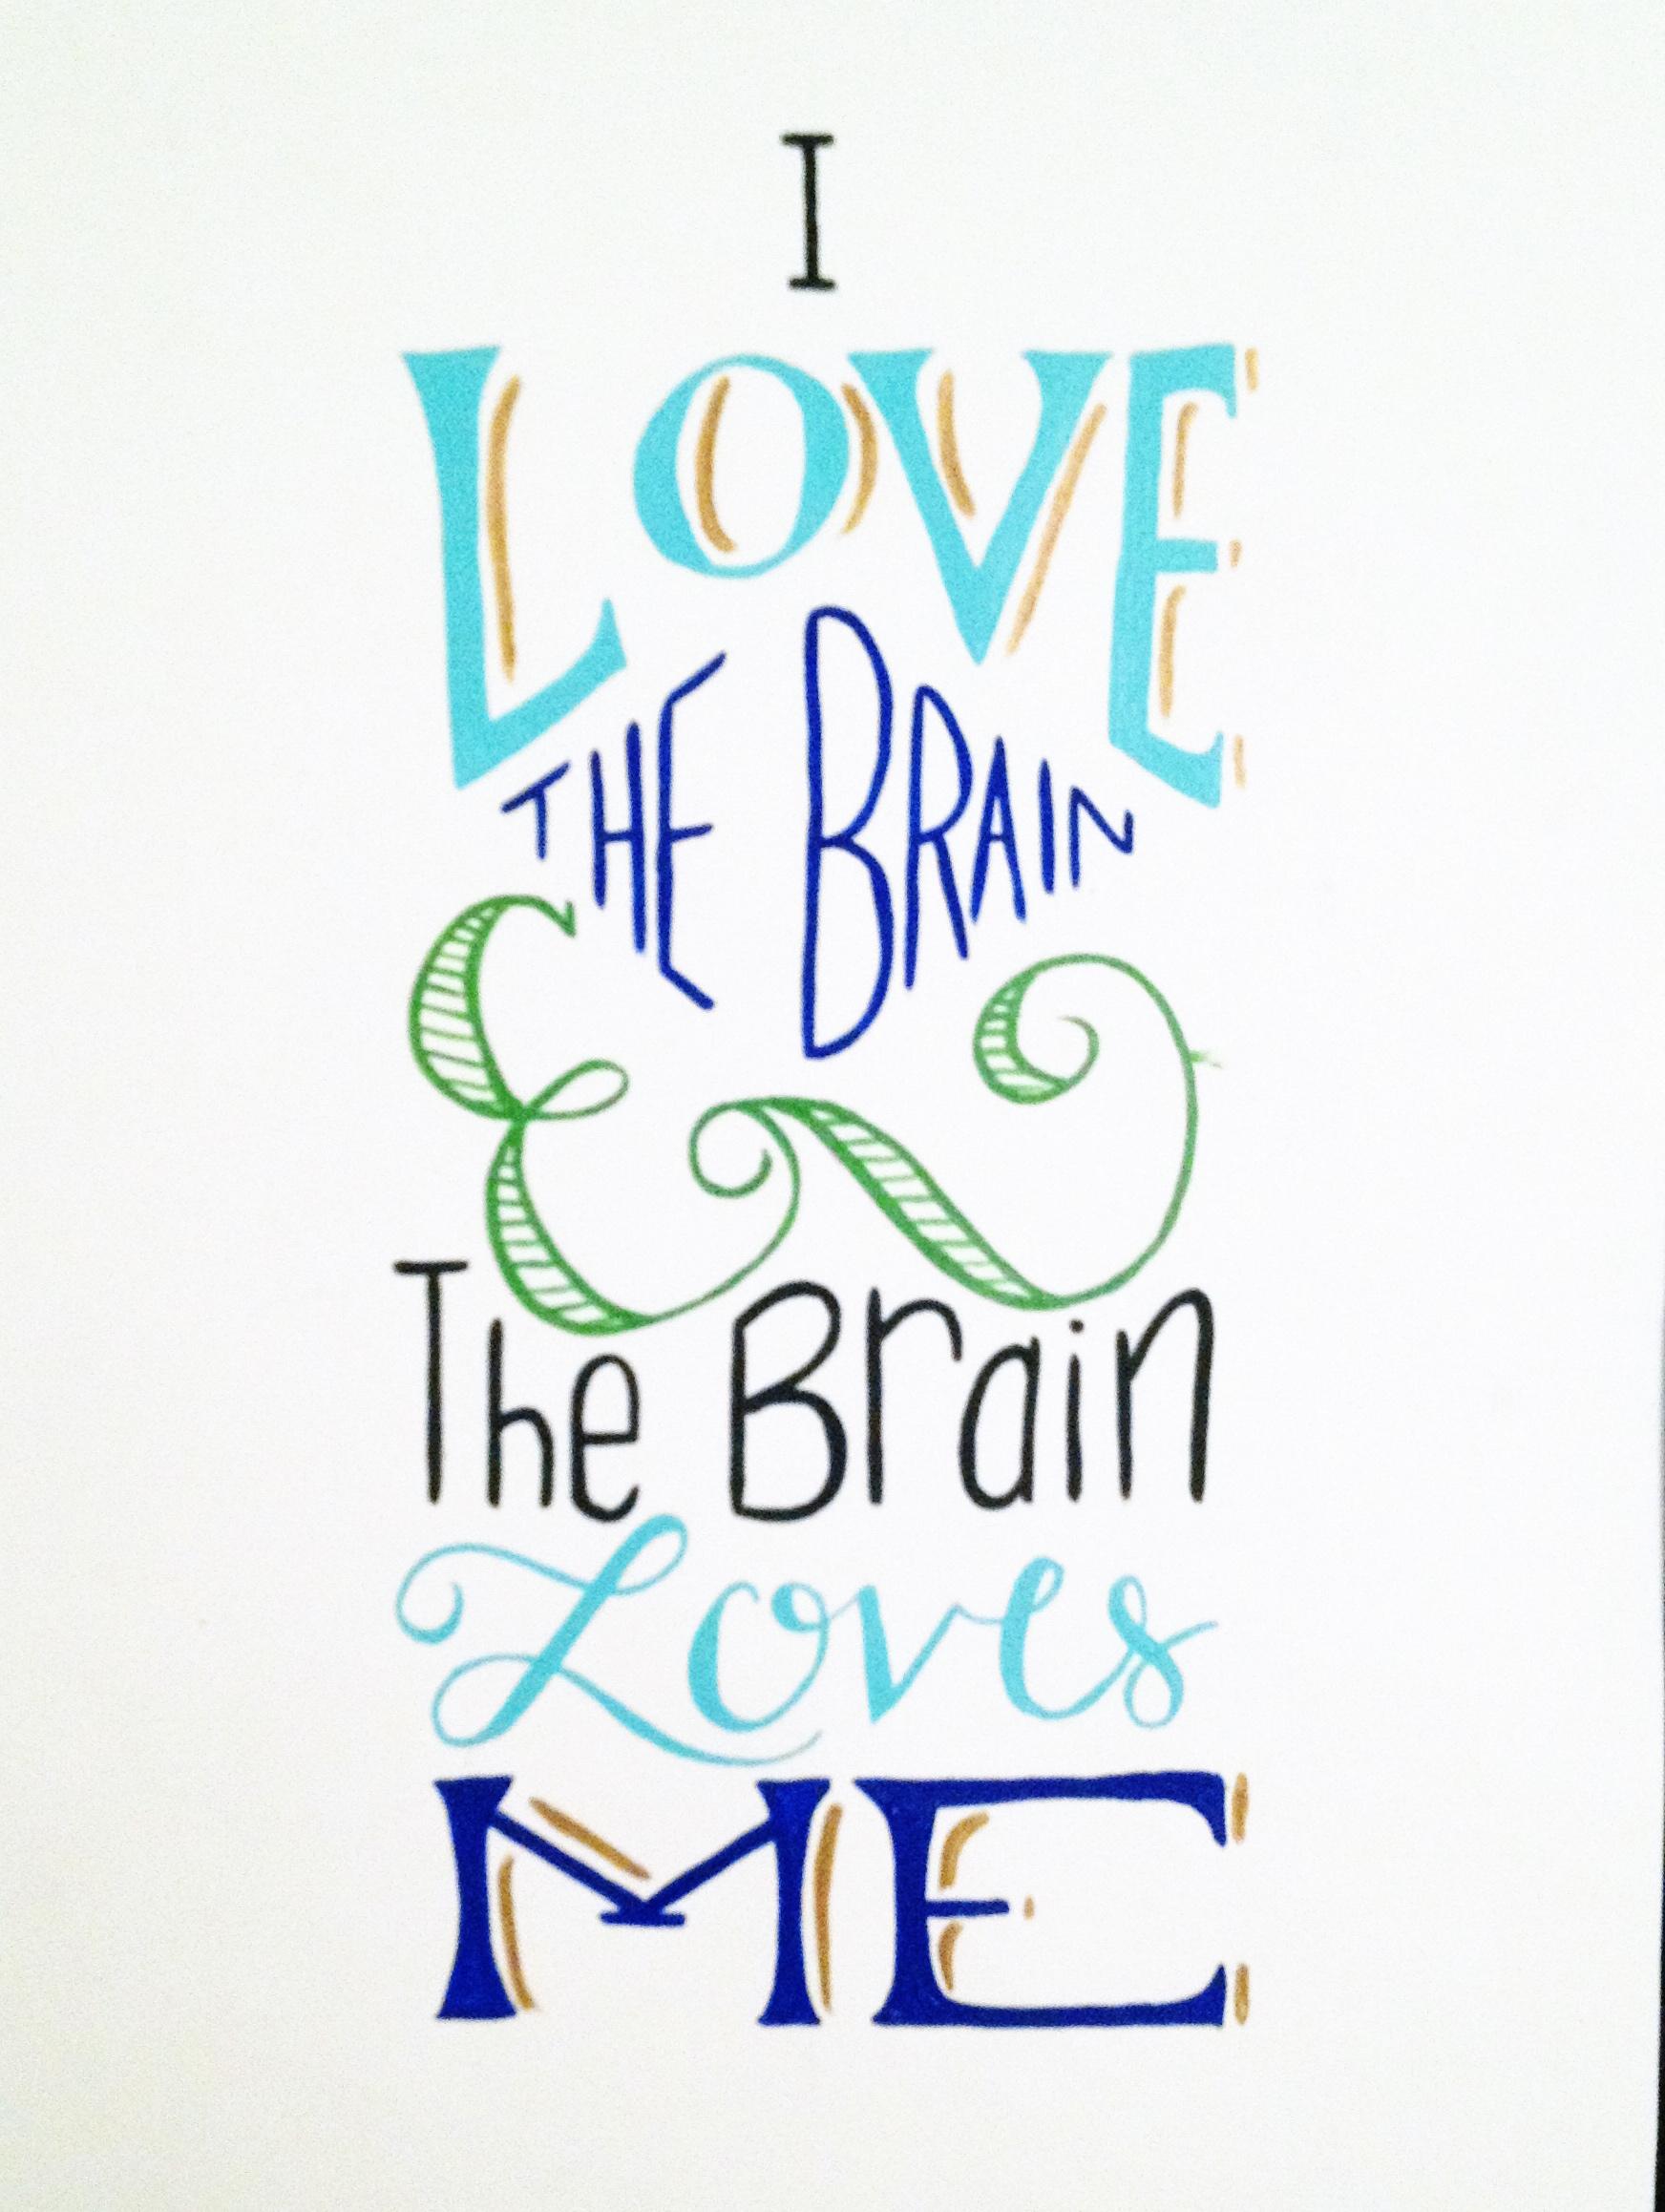 lovethebrain.JPG